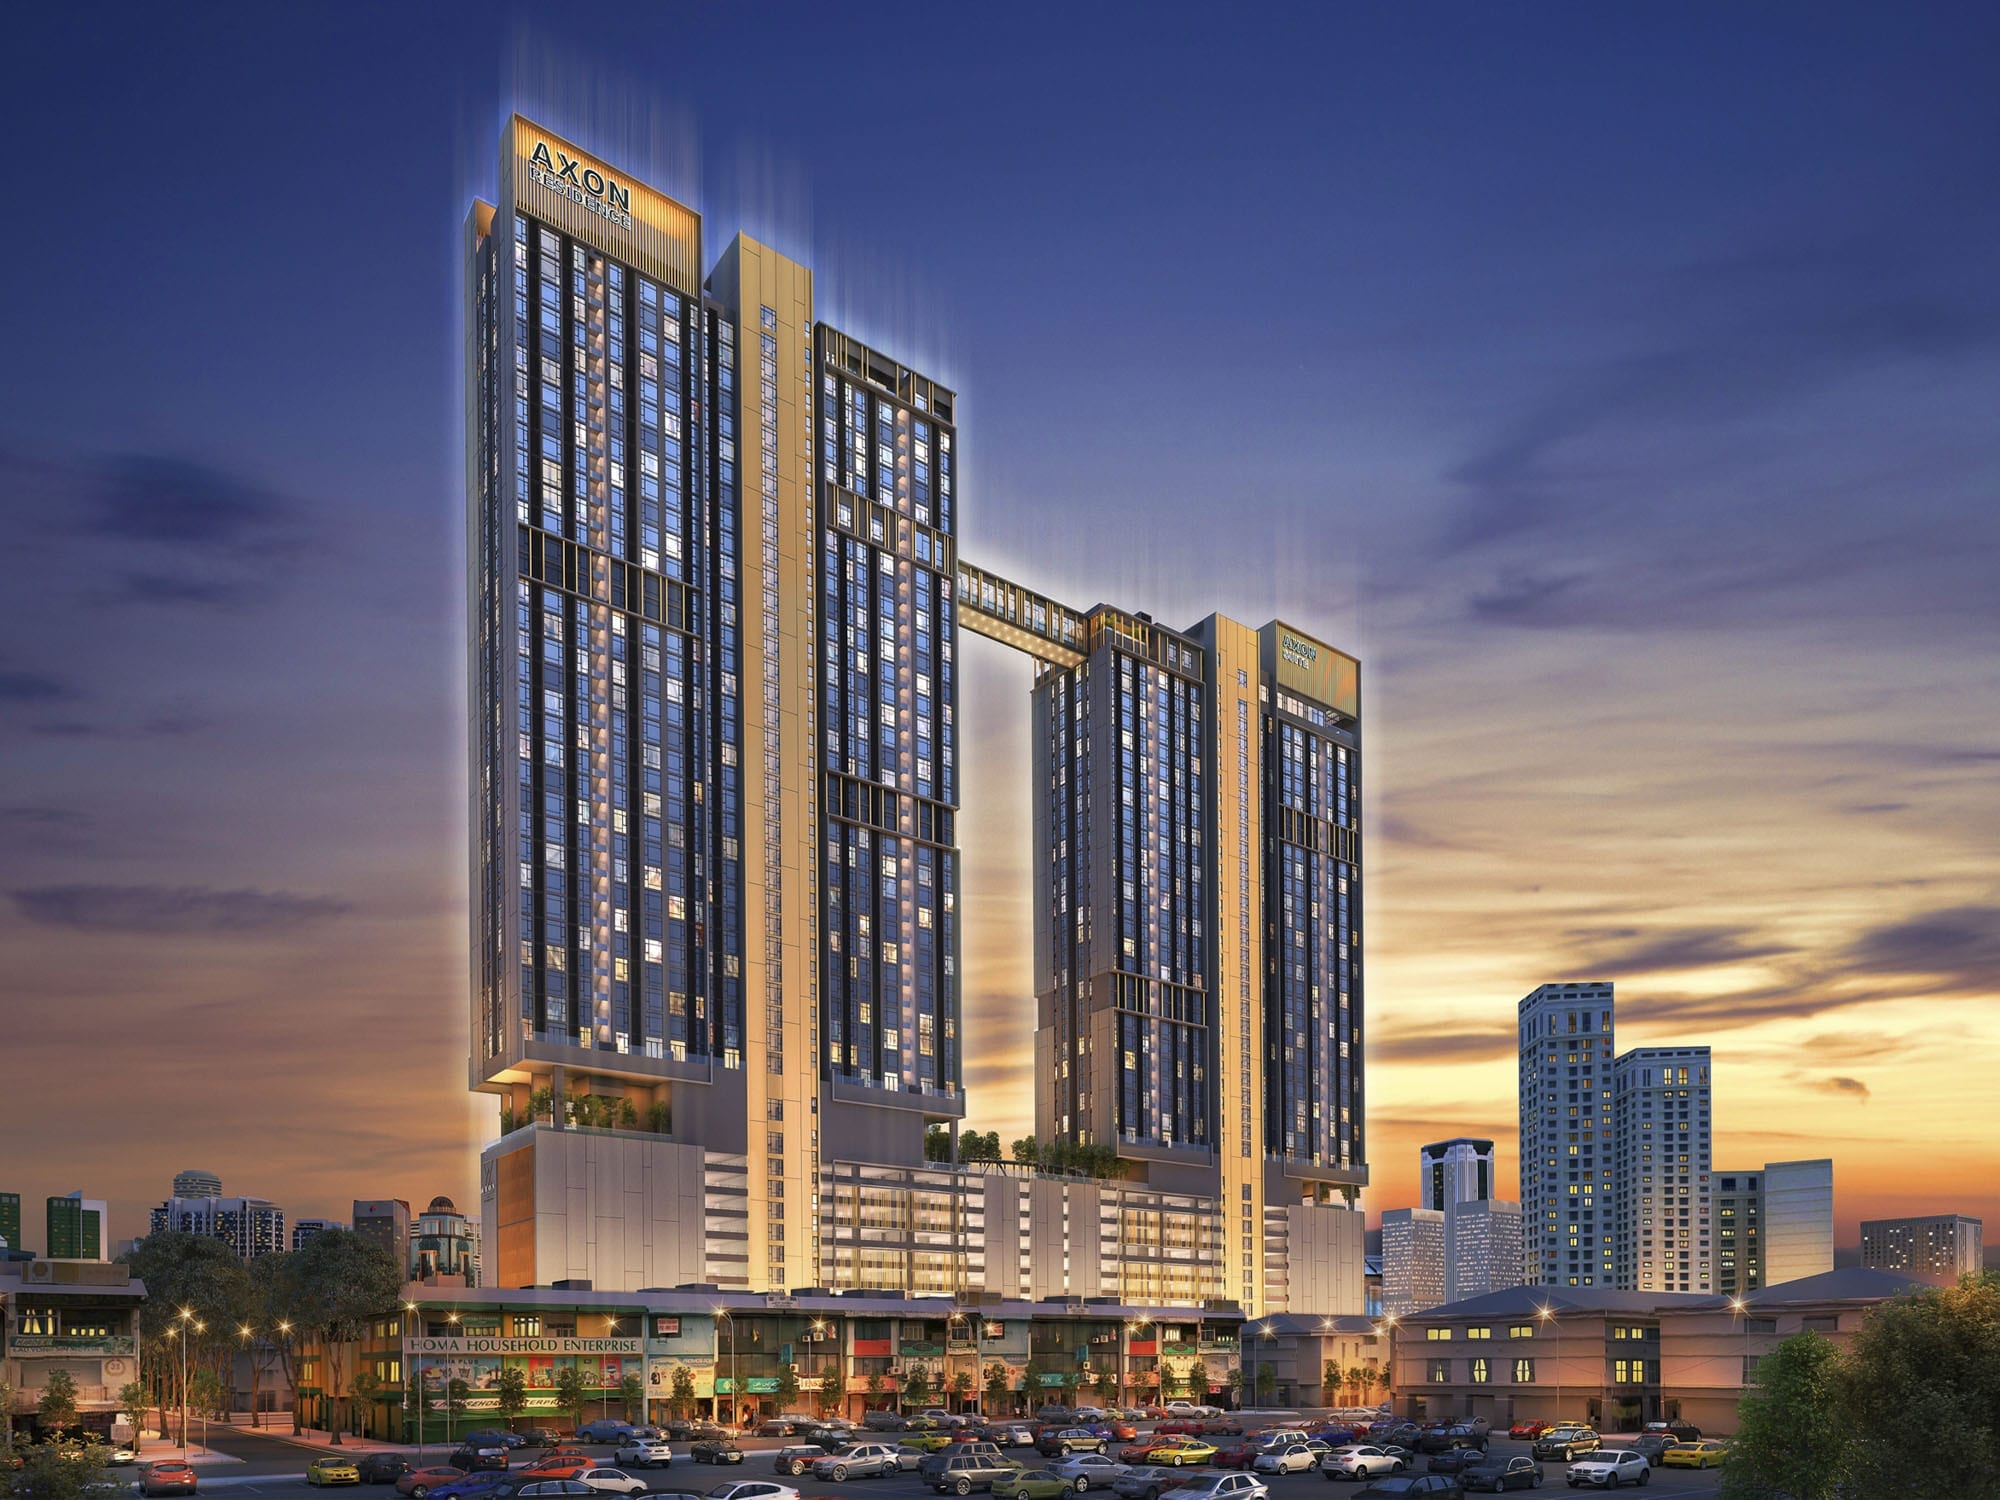 Axon Bukit Bintang Image 02